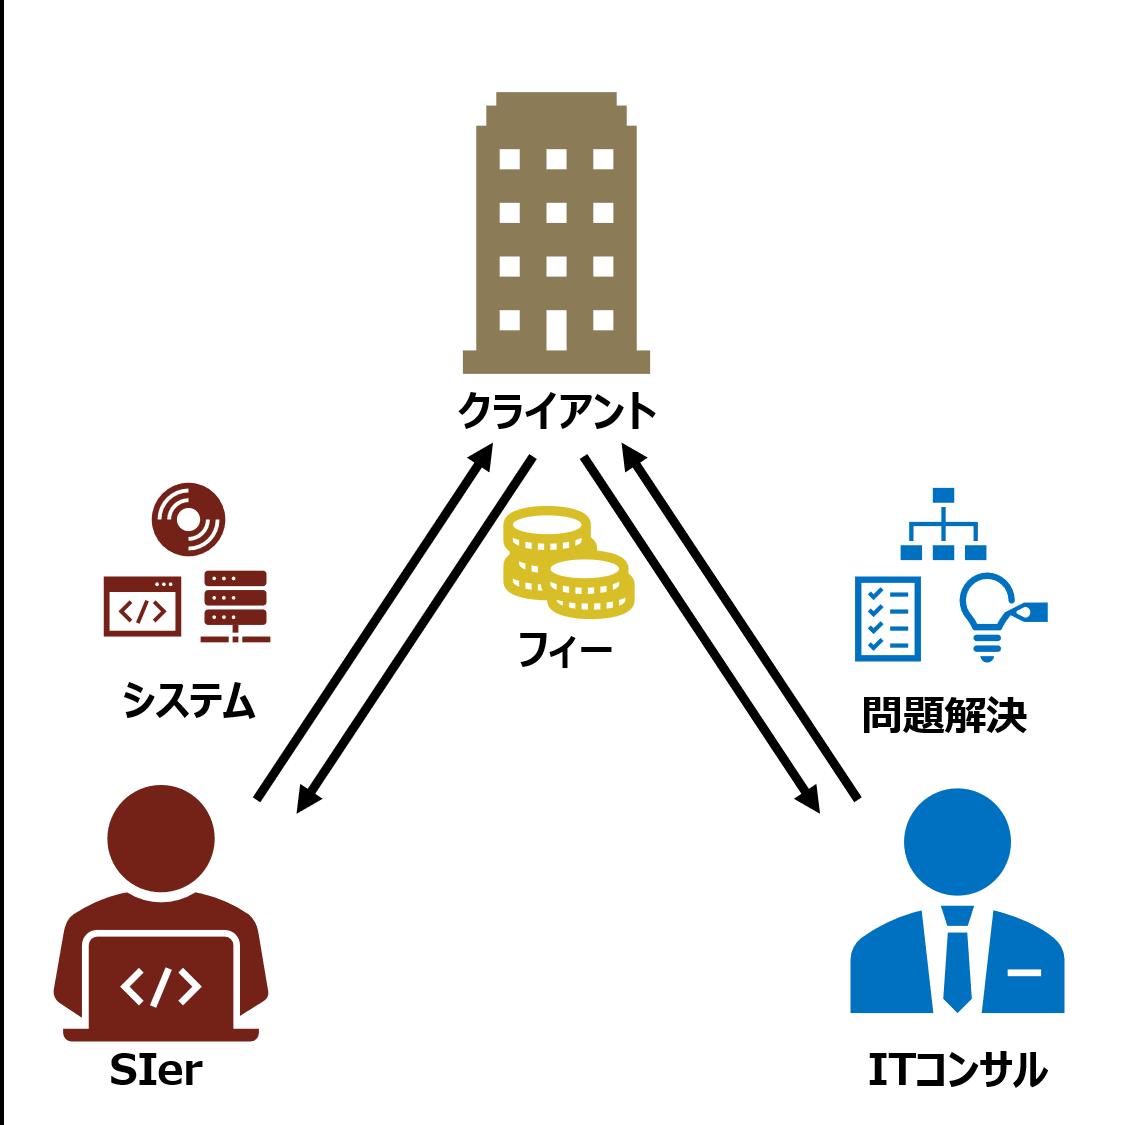 f:id:okui-ryo-assign:20200130231340p:plain:w400